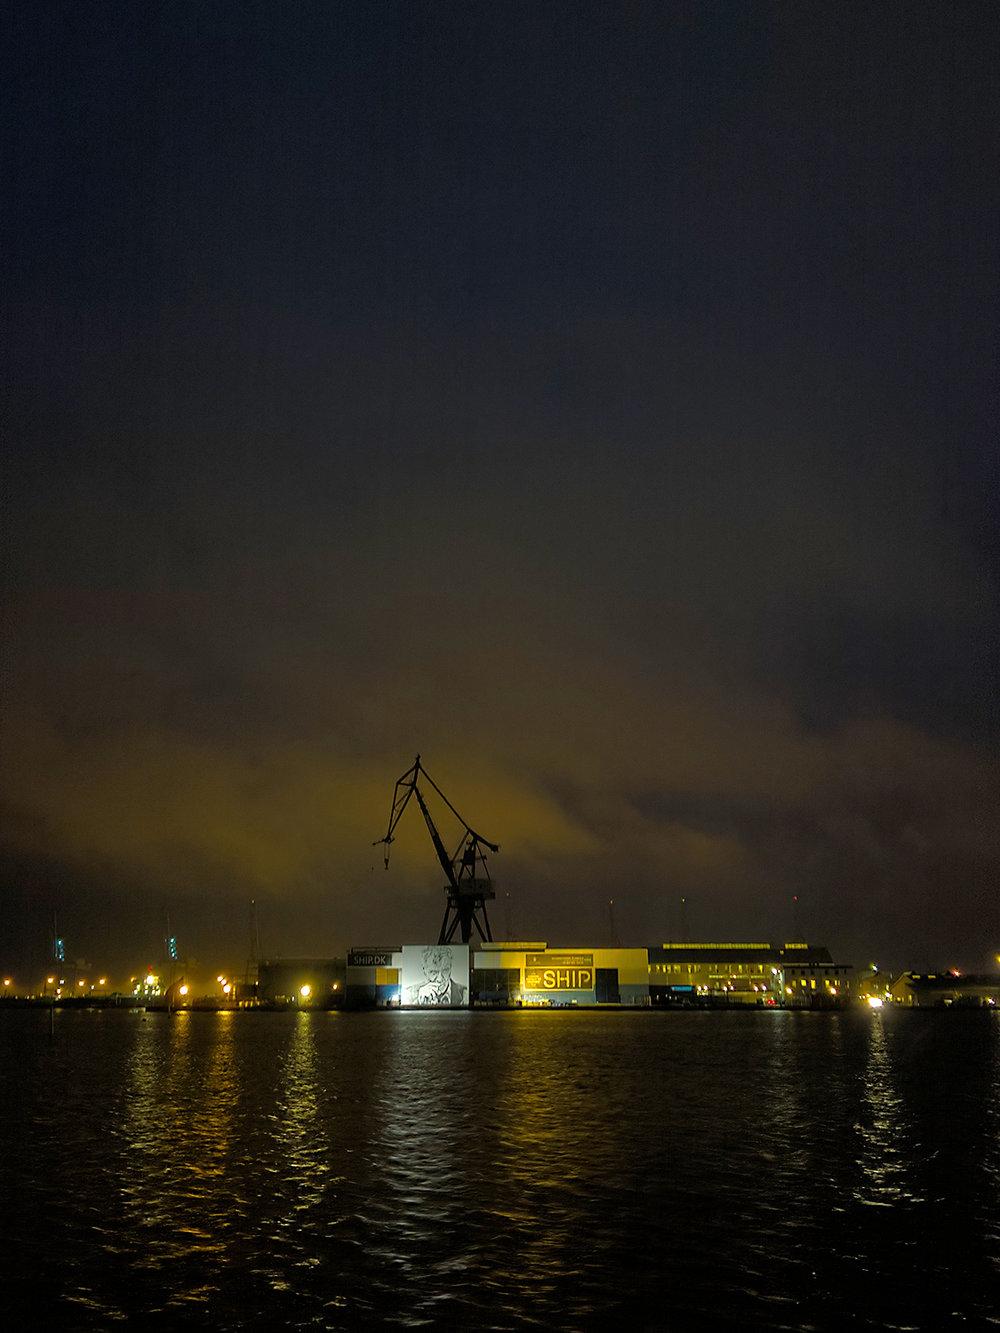 runjmrun aarhus dec 3 2018 ship.JPG